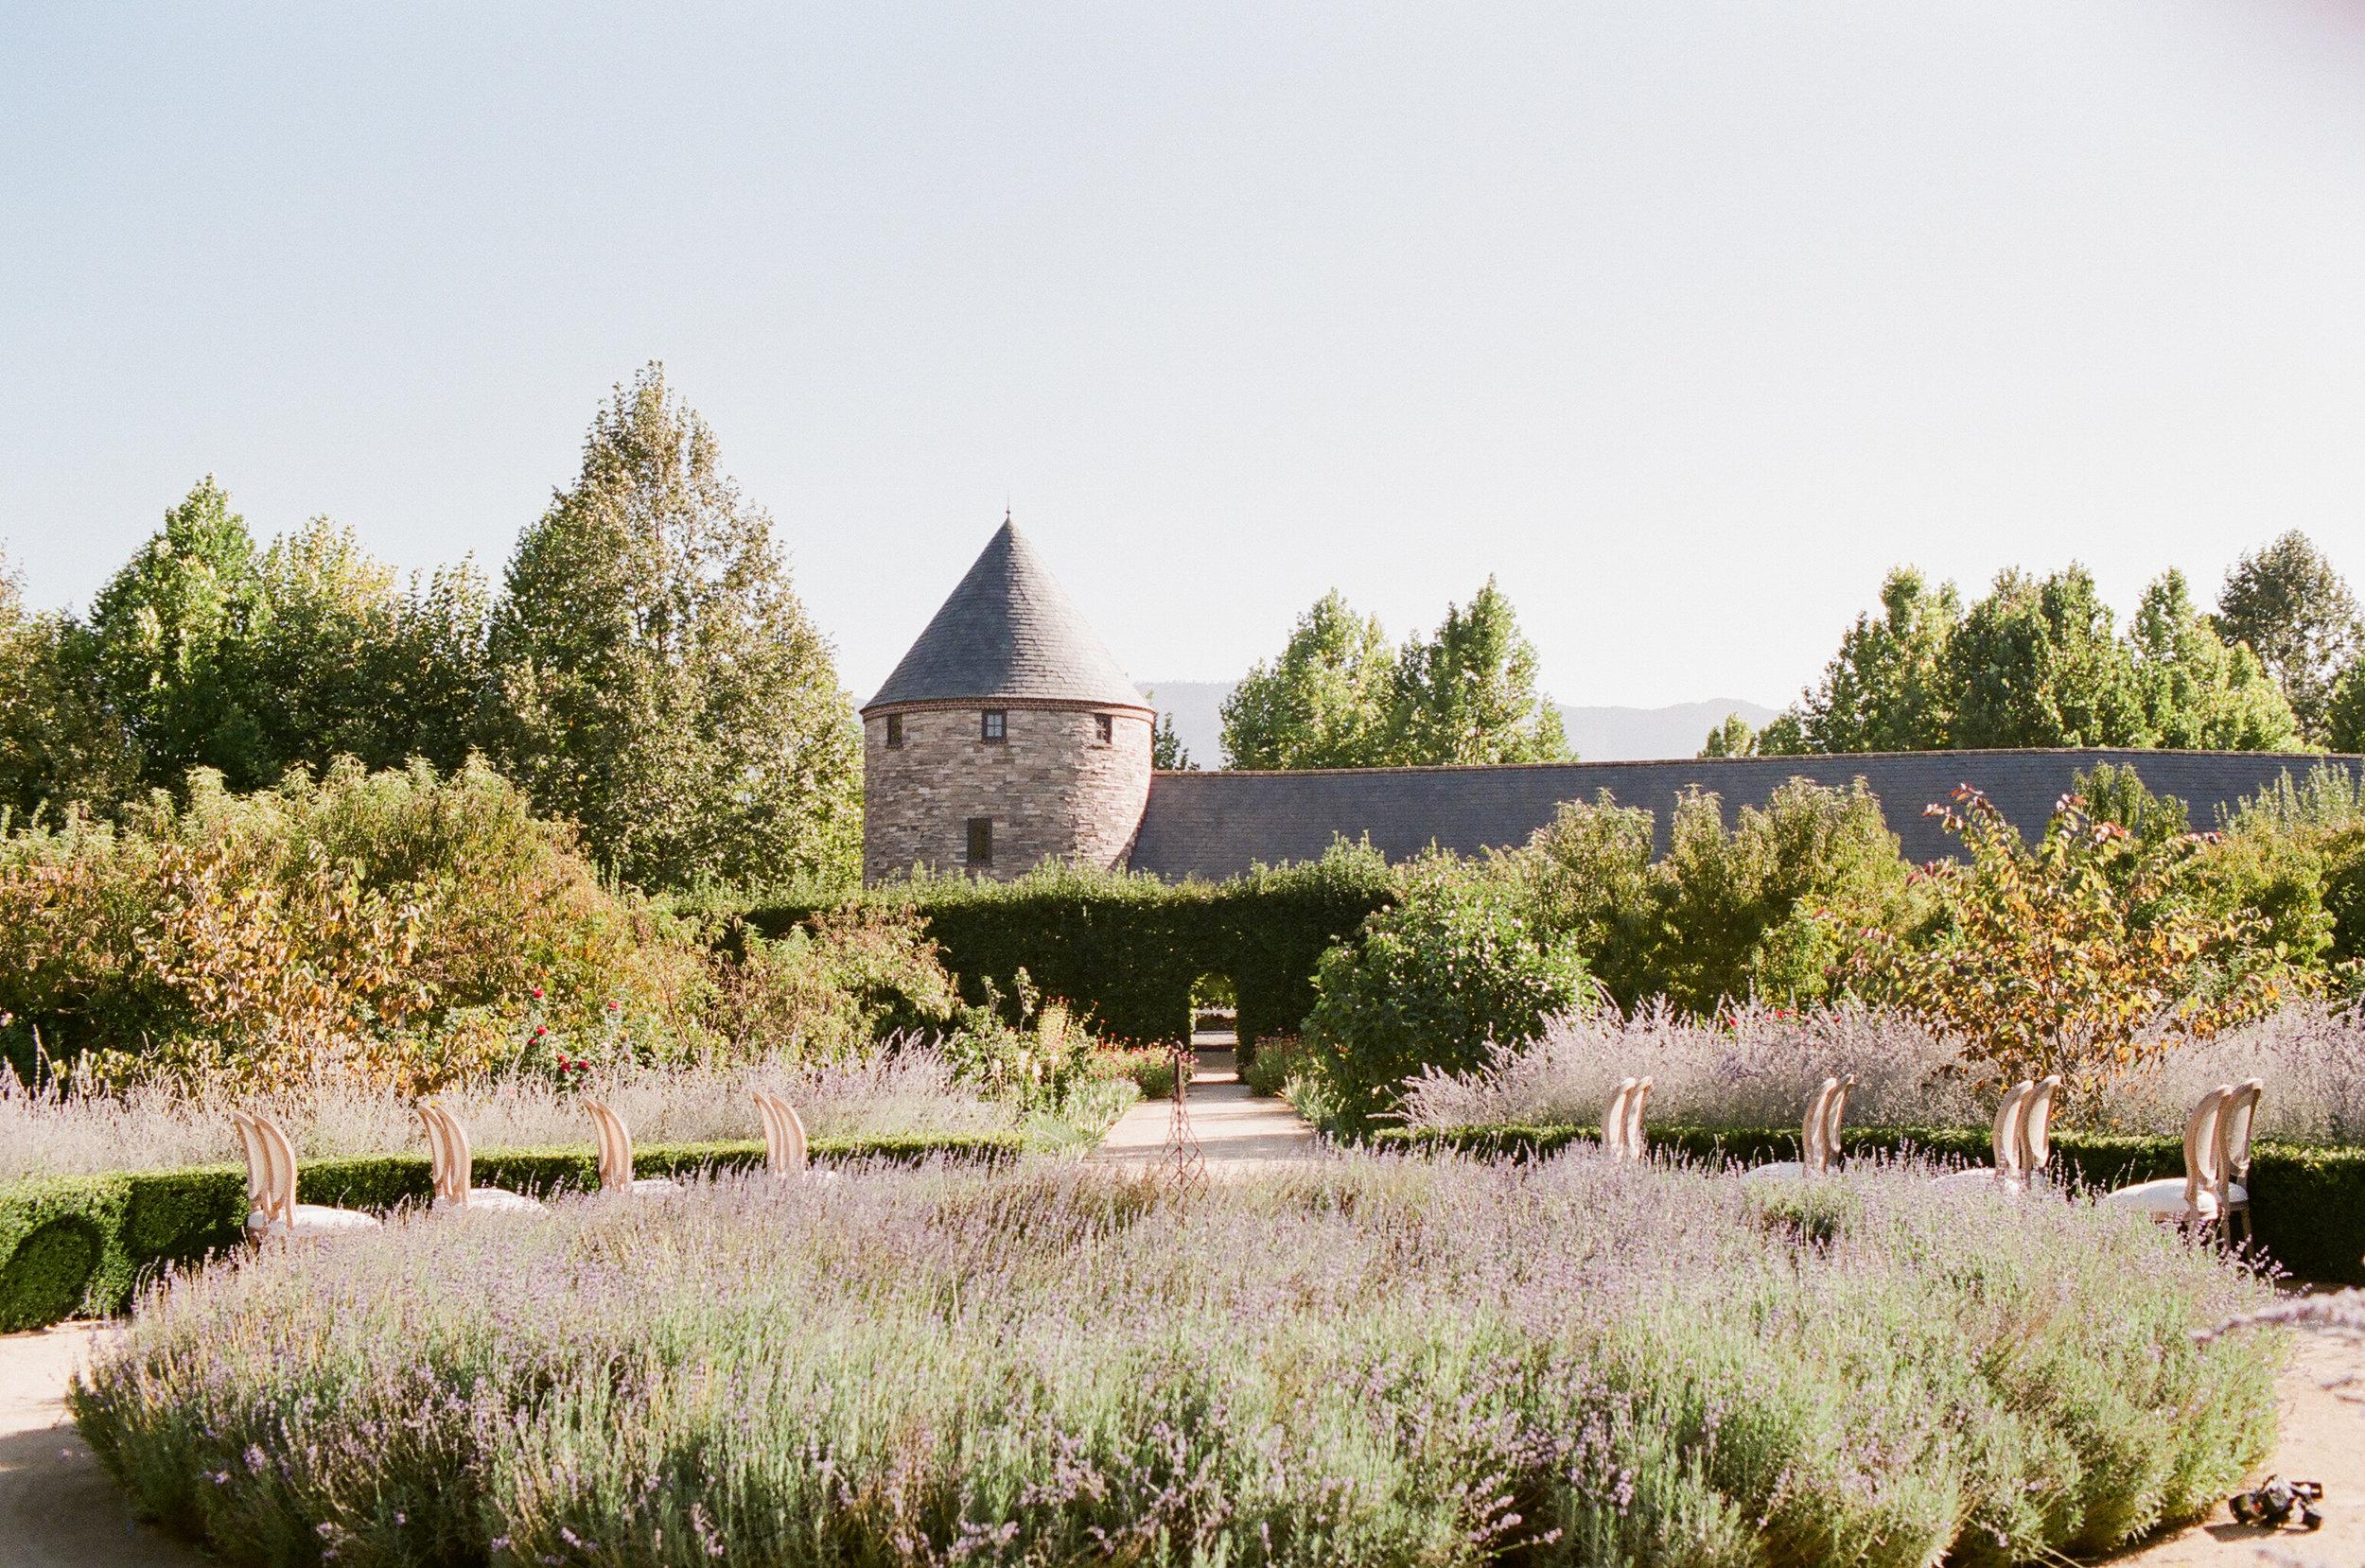 santa-barbara-elopement-elope-wedding-planner-planning-coordinator-day-of-intimate-event-design-kestrel-park-santa-ynez-english-country-estate-garden-castle (14).jpg